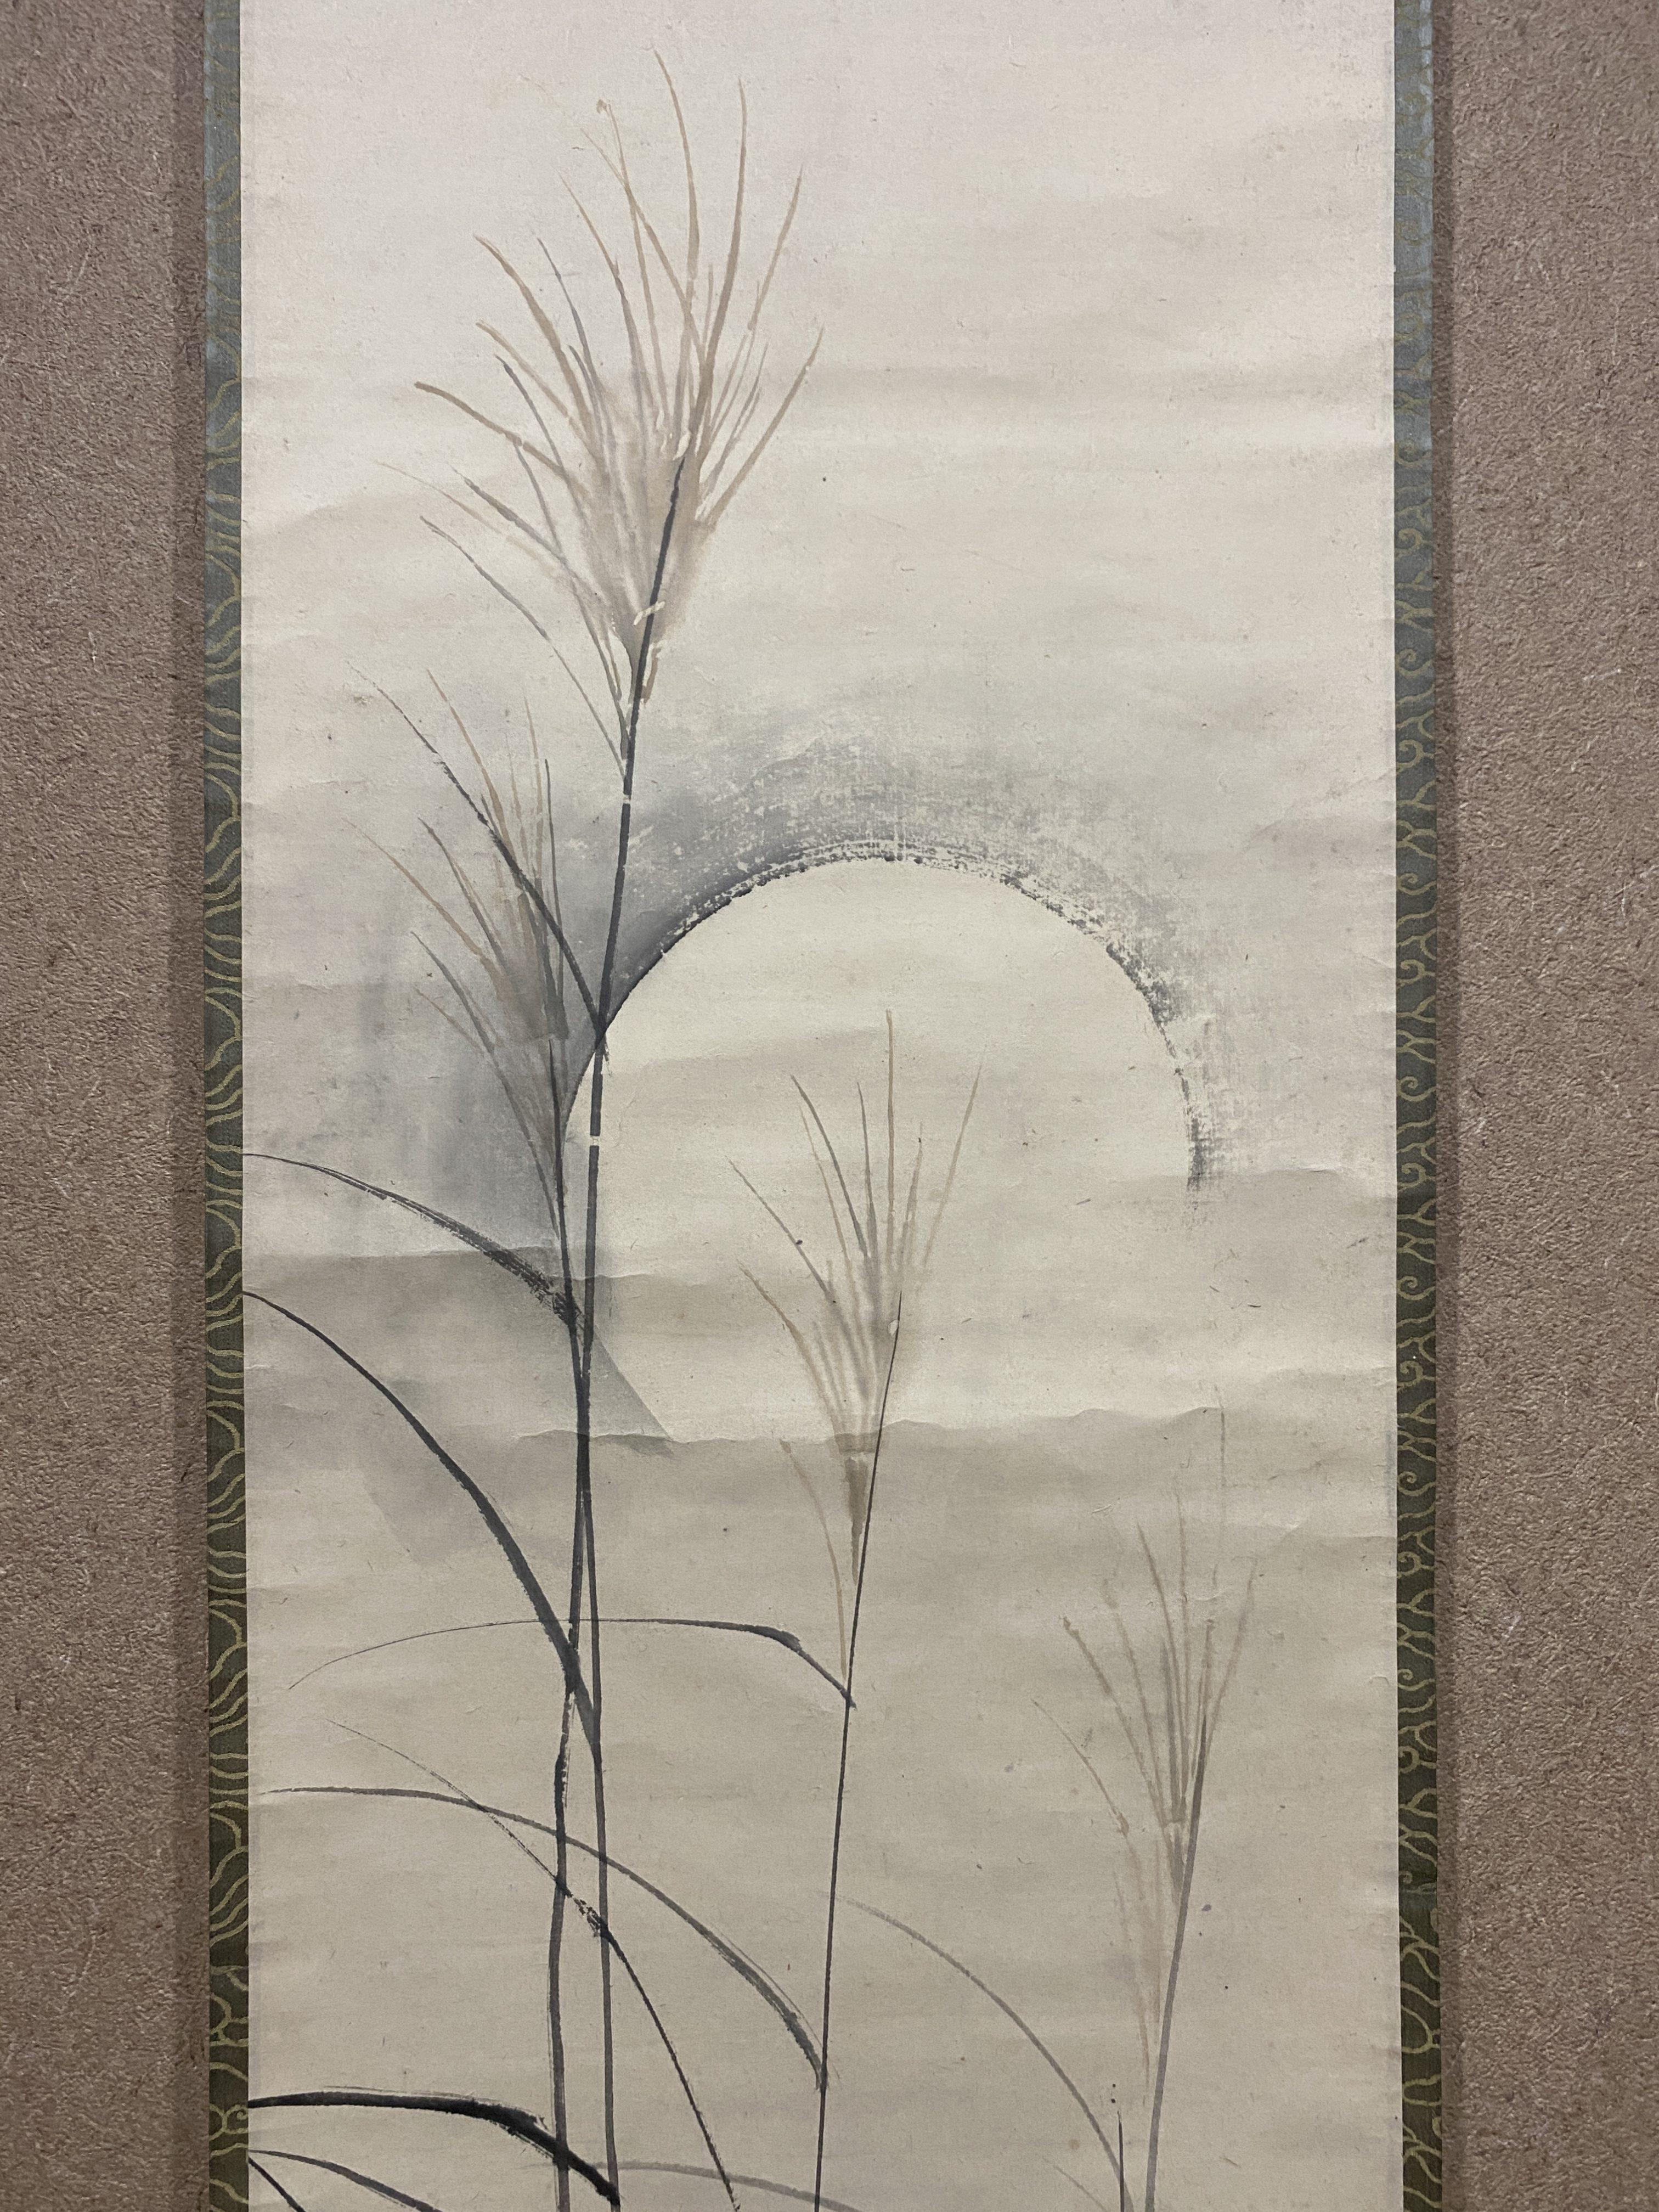 鈴木松年 秋草に月図